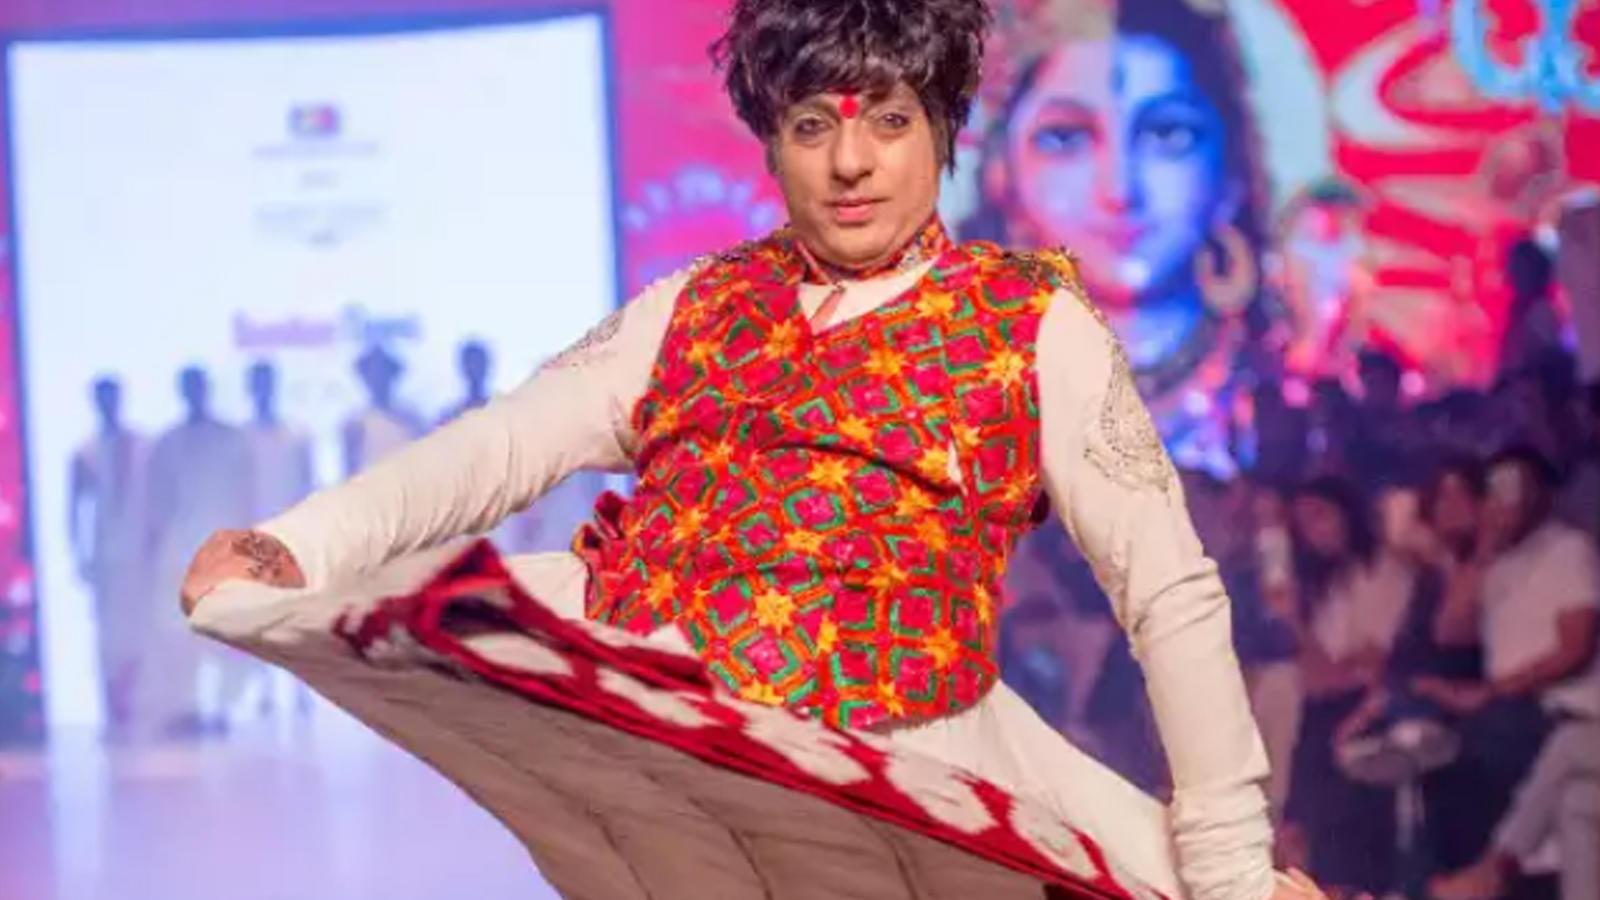 Designer Rohit Verma S Sindoor Khela Showcase The Women Power On Ramp Events Movie News Times Of India